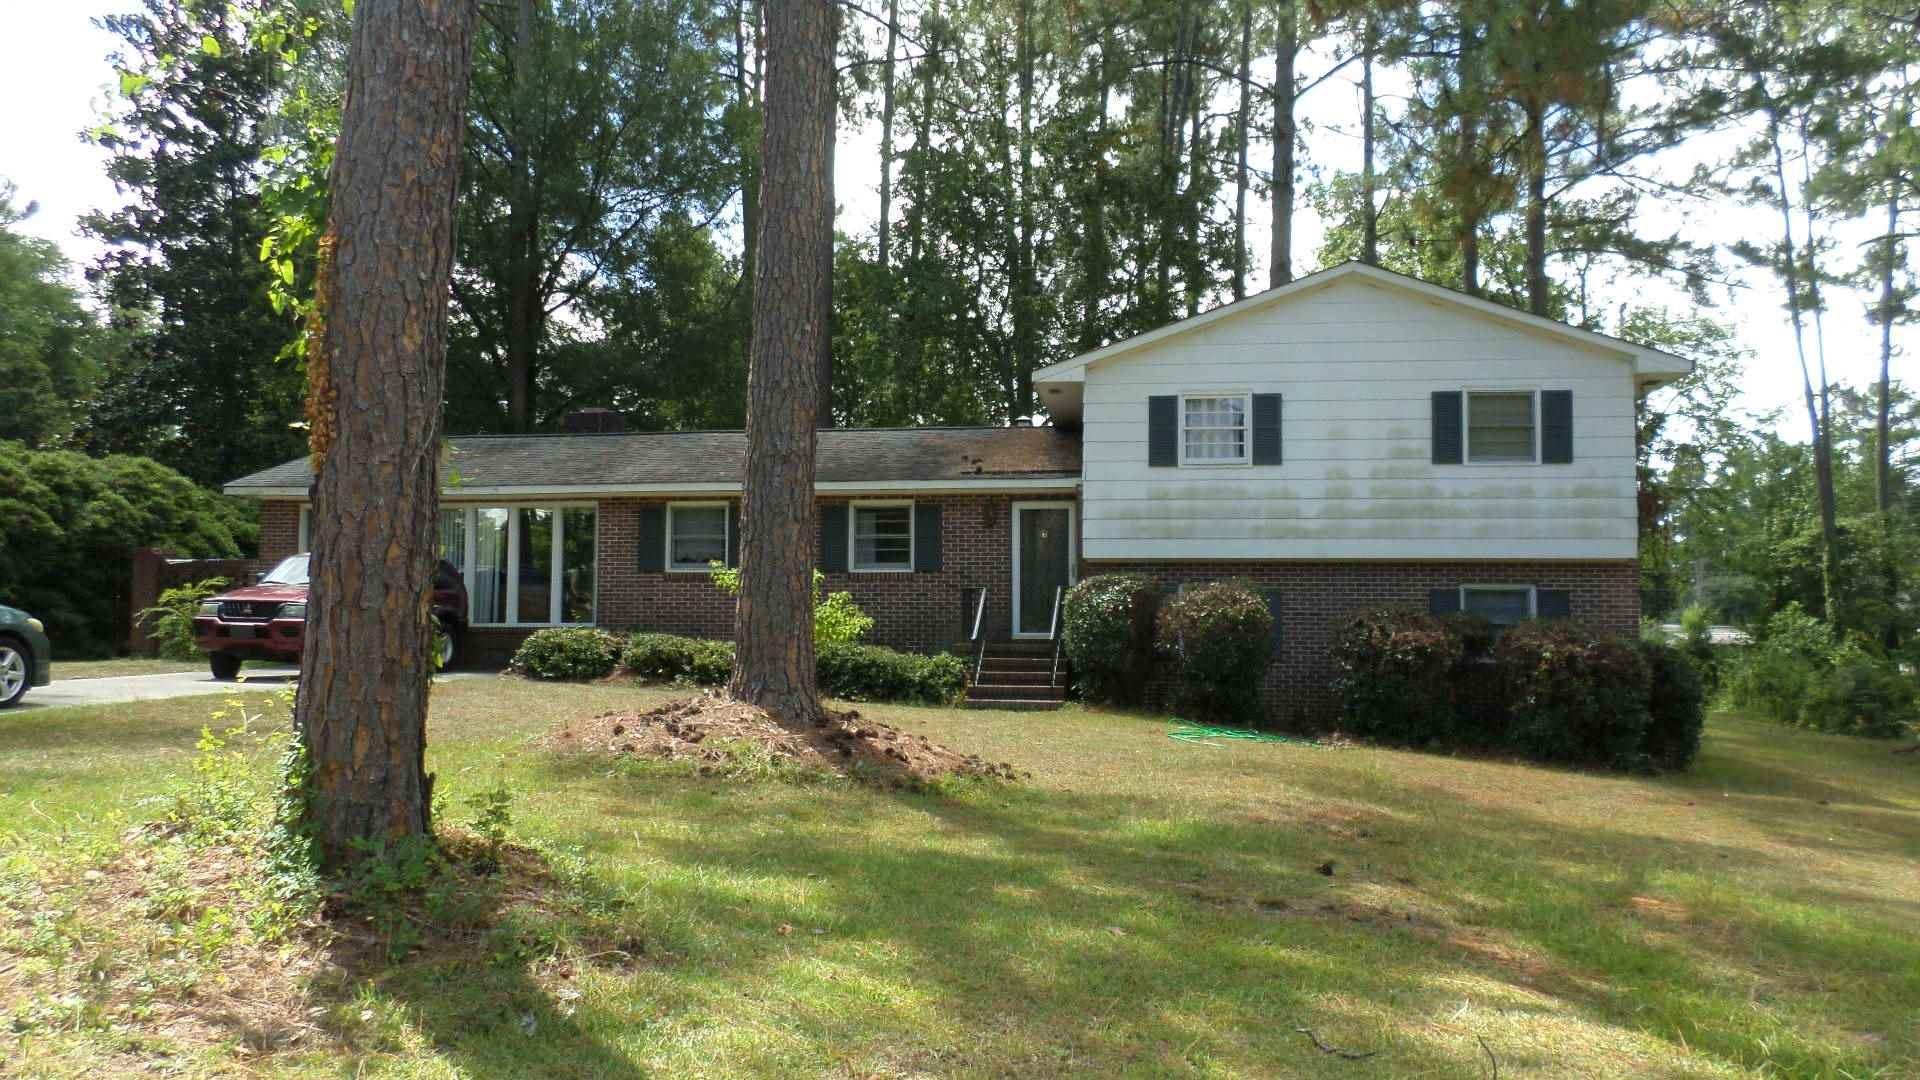 1707 Briarcliff Ct, Milledgeville, GA 31061 - MLS#: 8863675